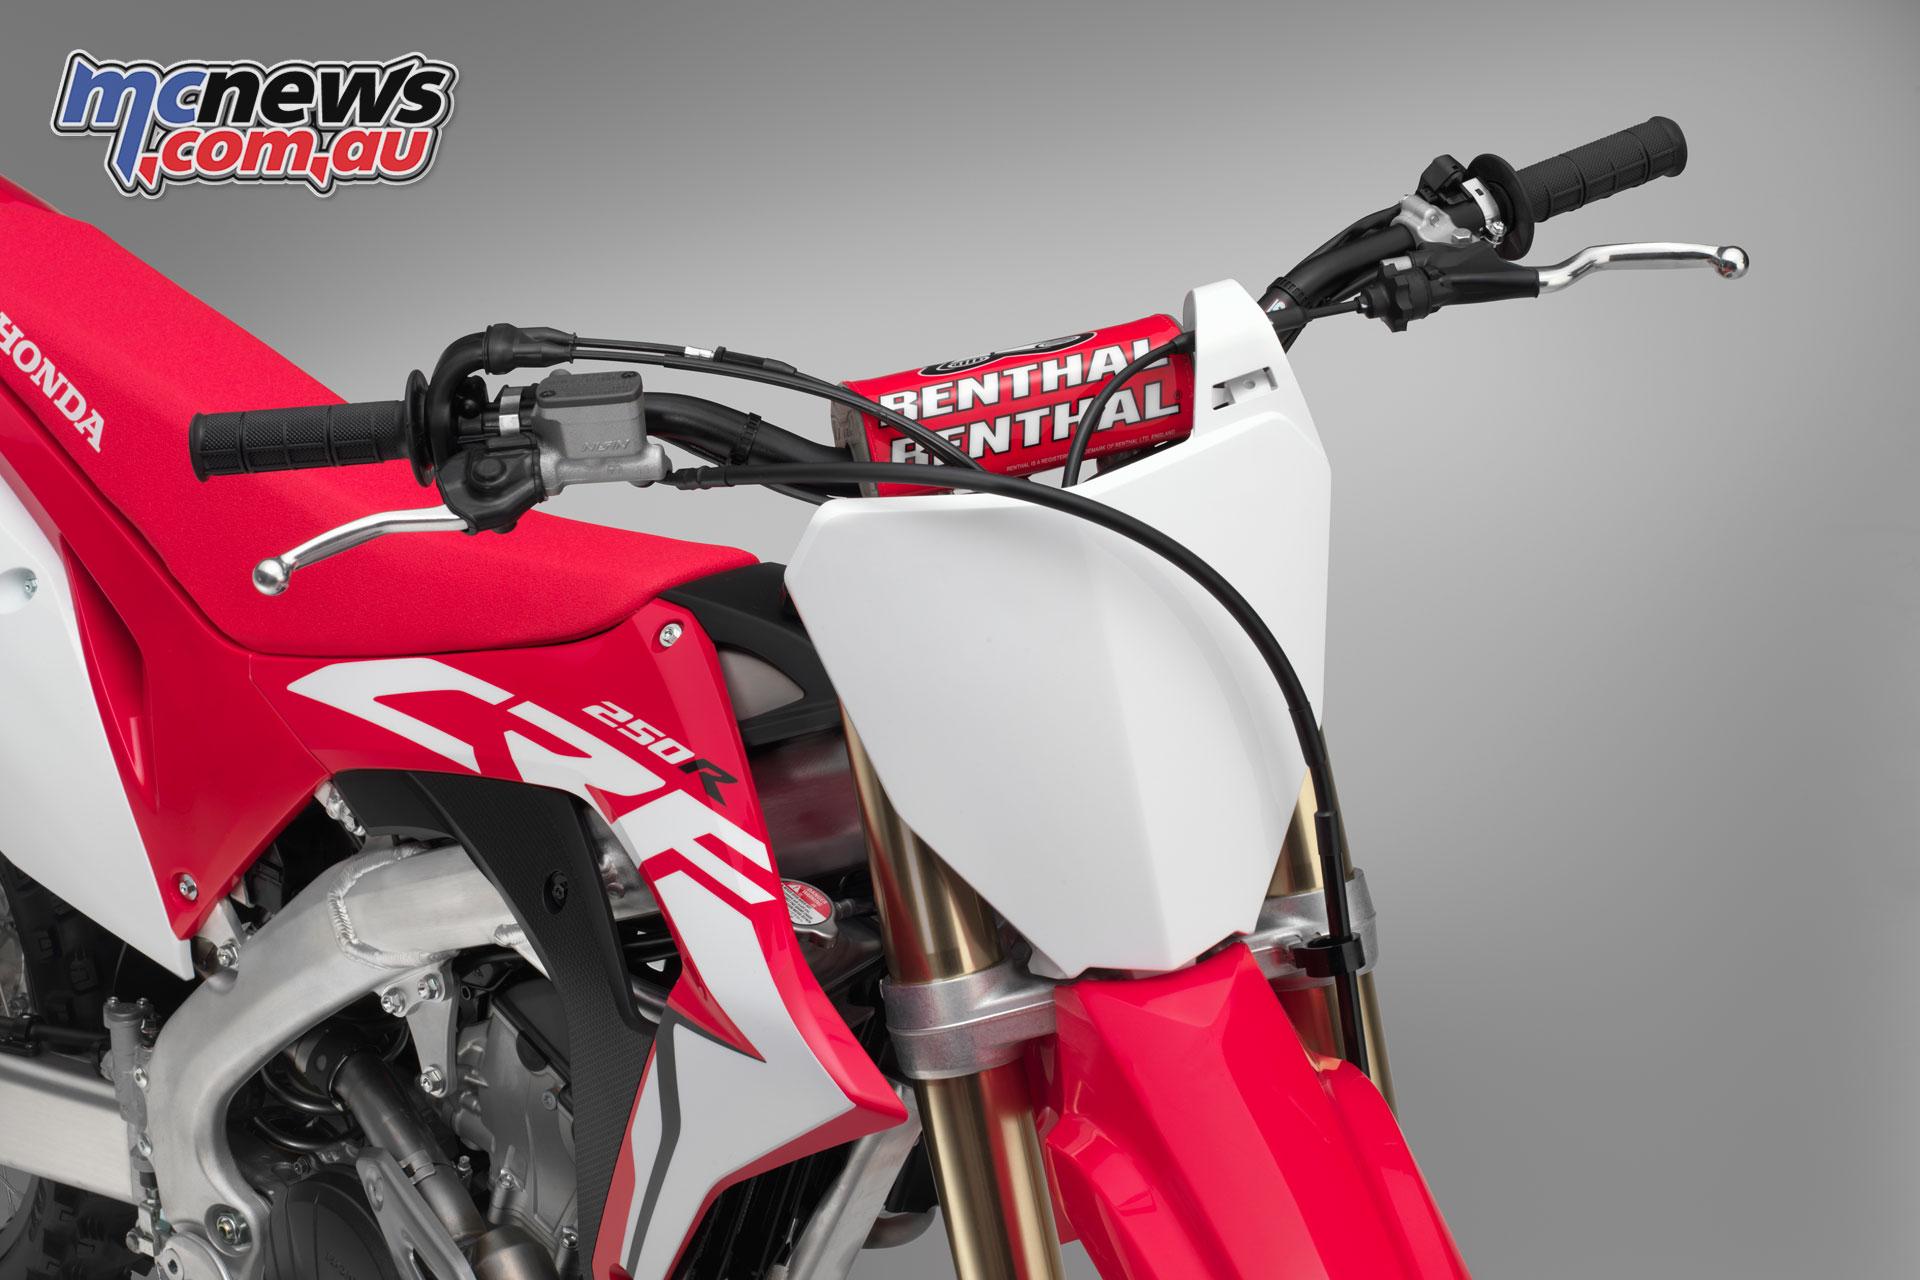 2019 Honda CRF motocrossers land in dealers   MCNews com au